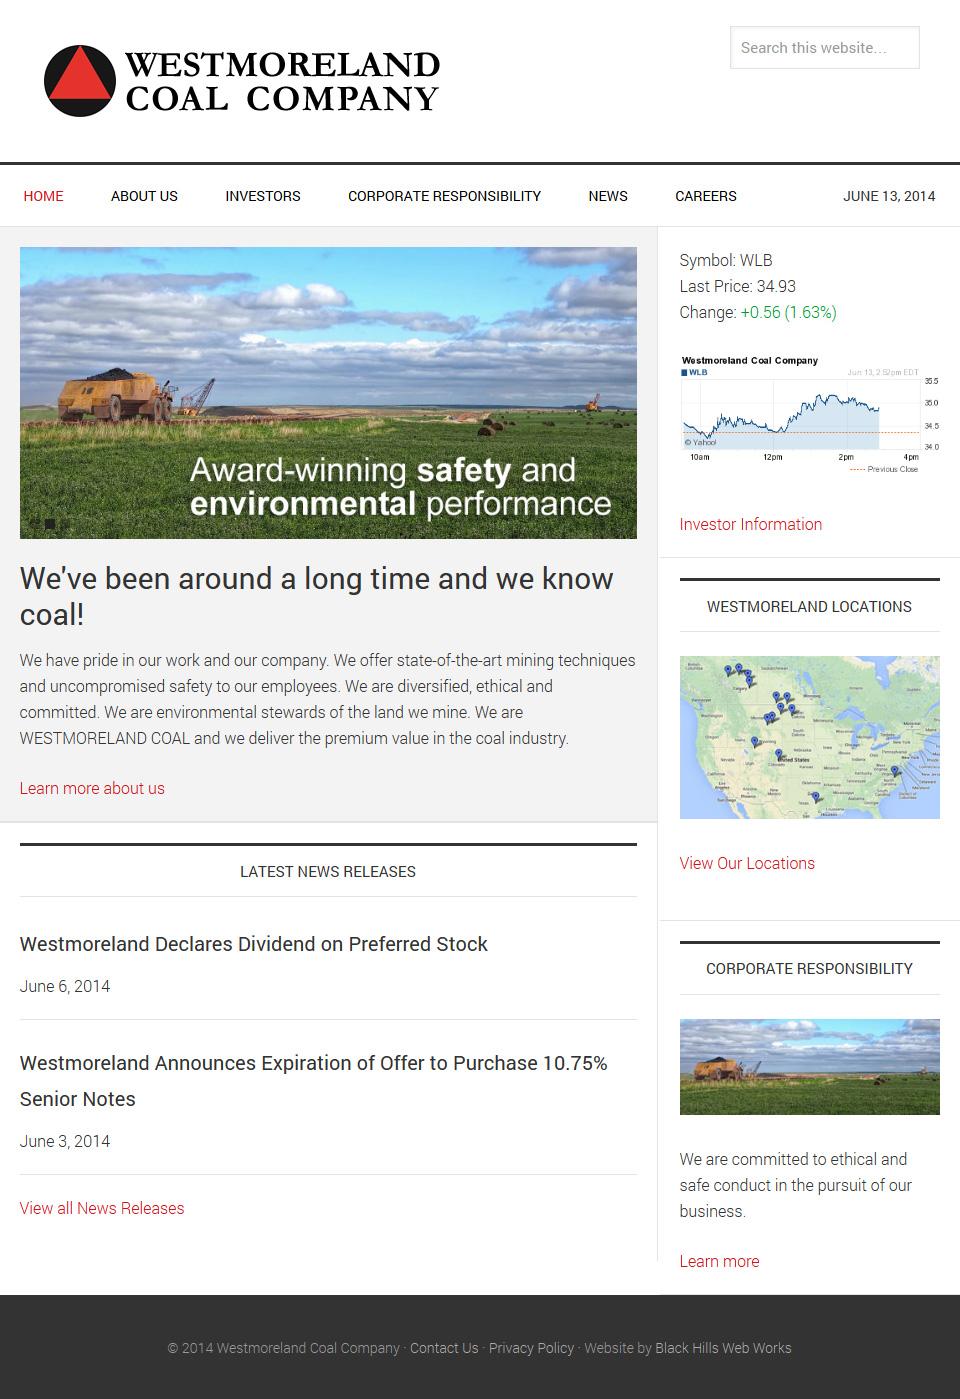 Westmoreland Coal Company Home page